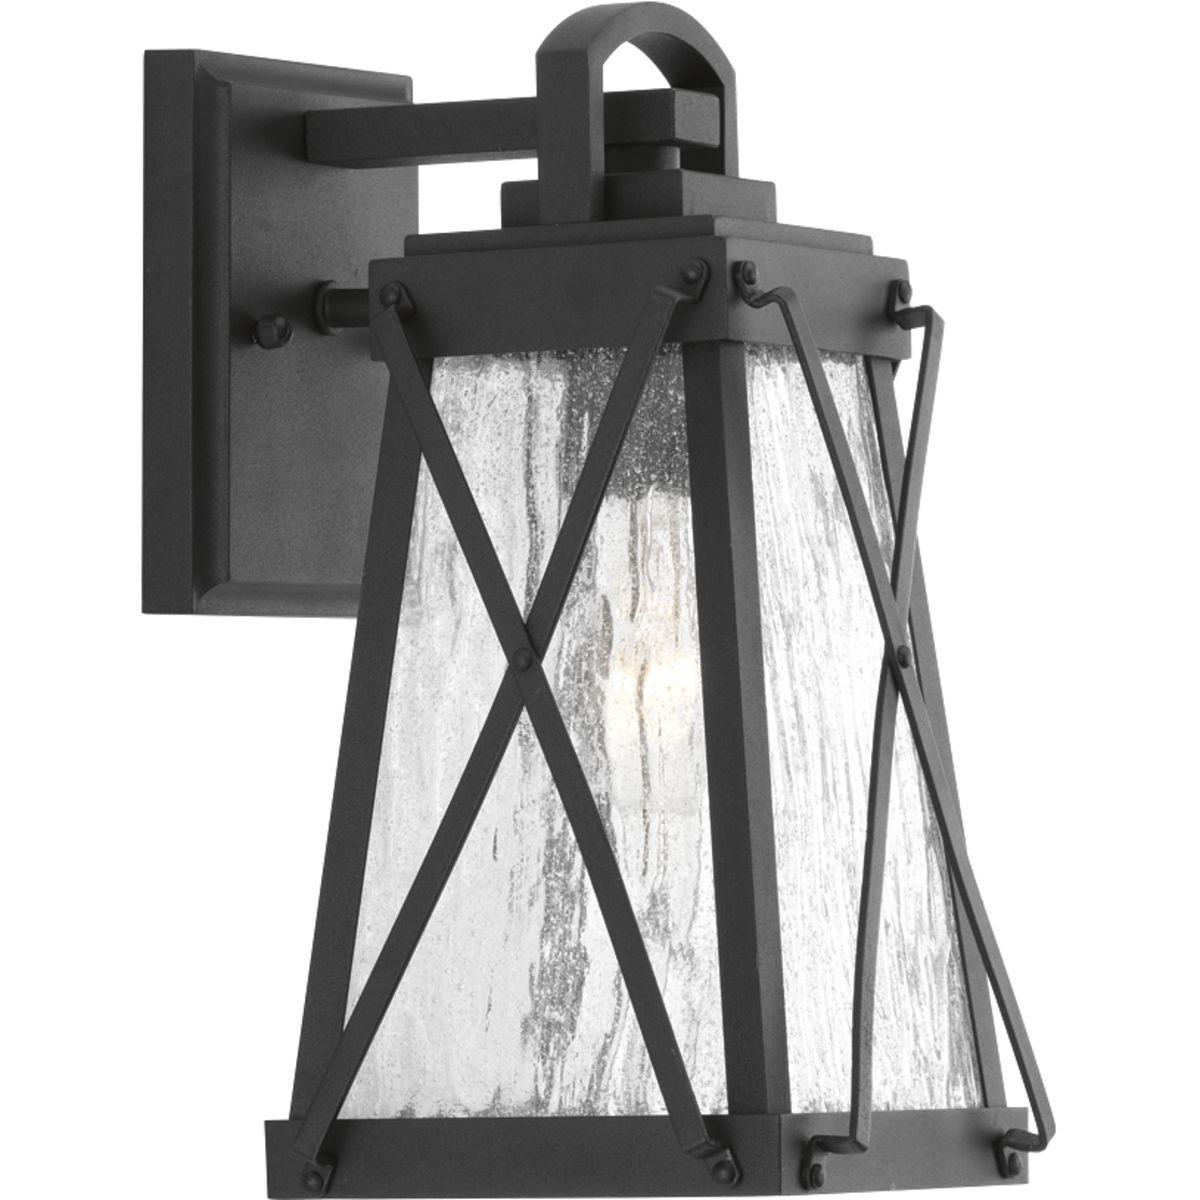 P560031-031 PROGRESS CREIGHTON 1-100W MED WALL LANTERN BLACK